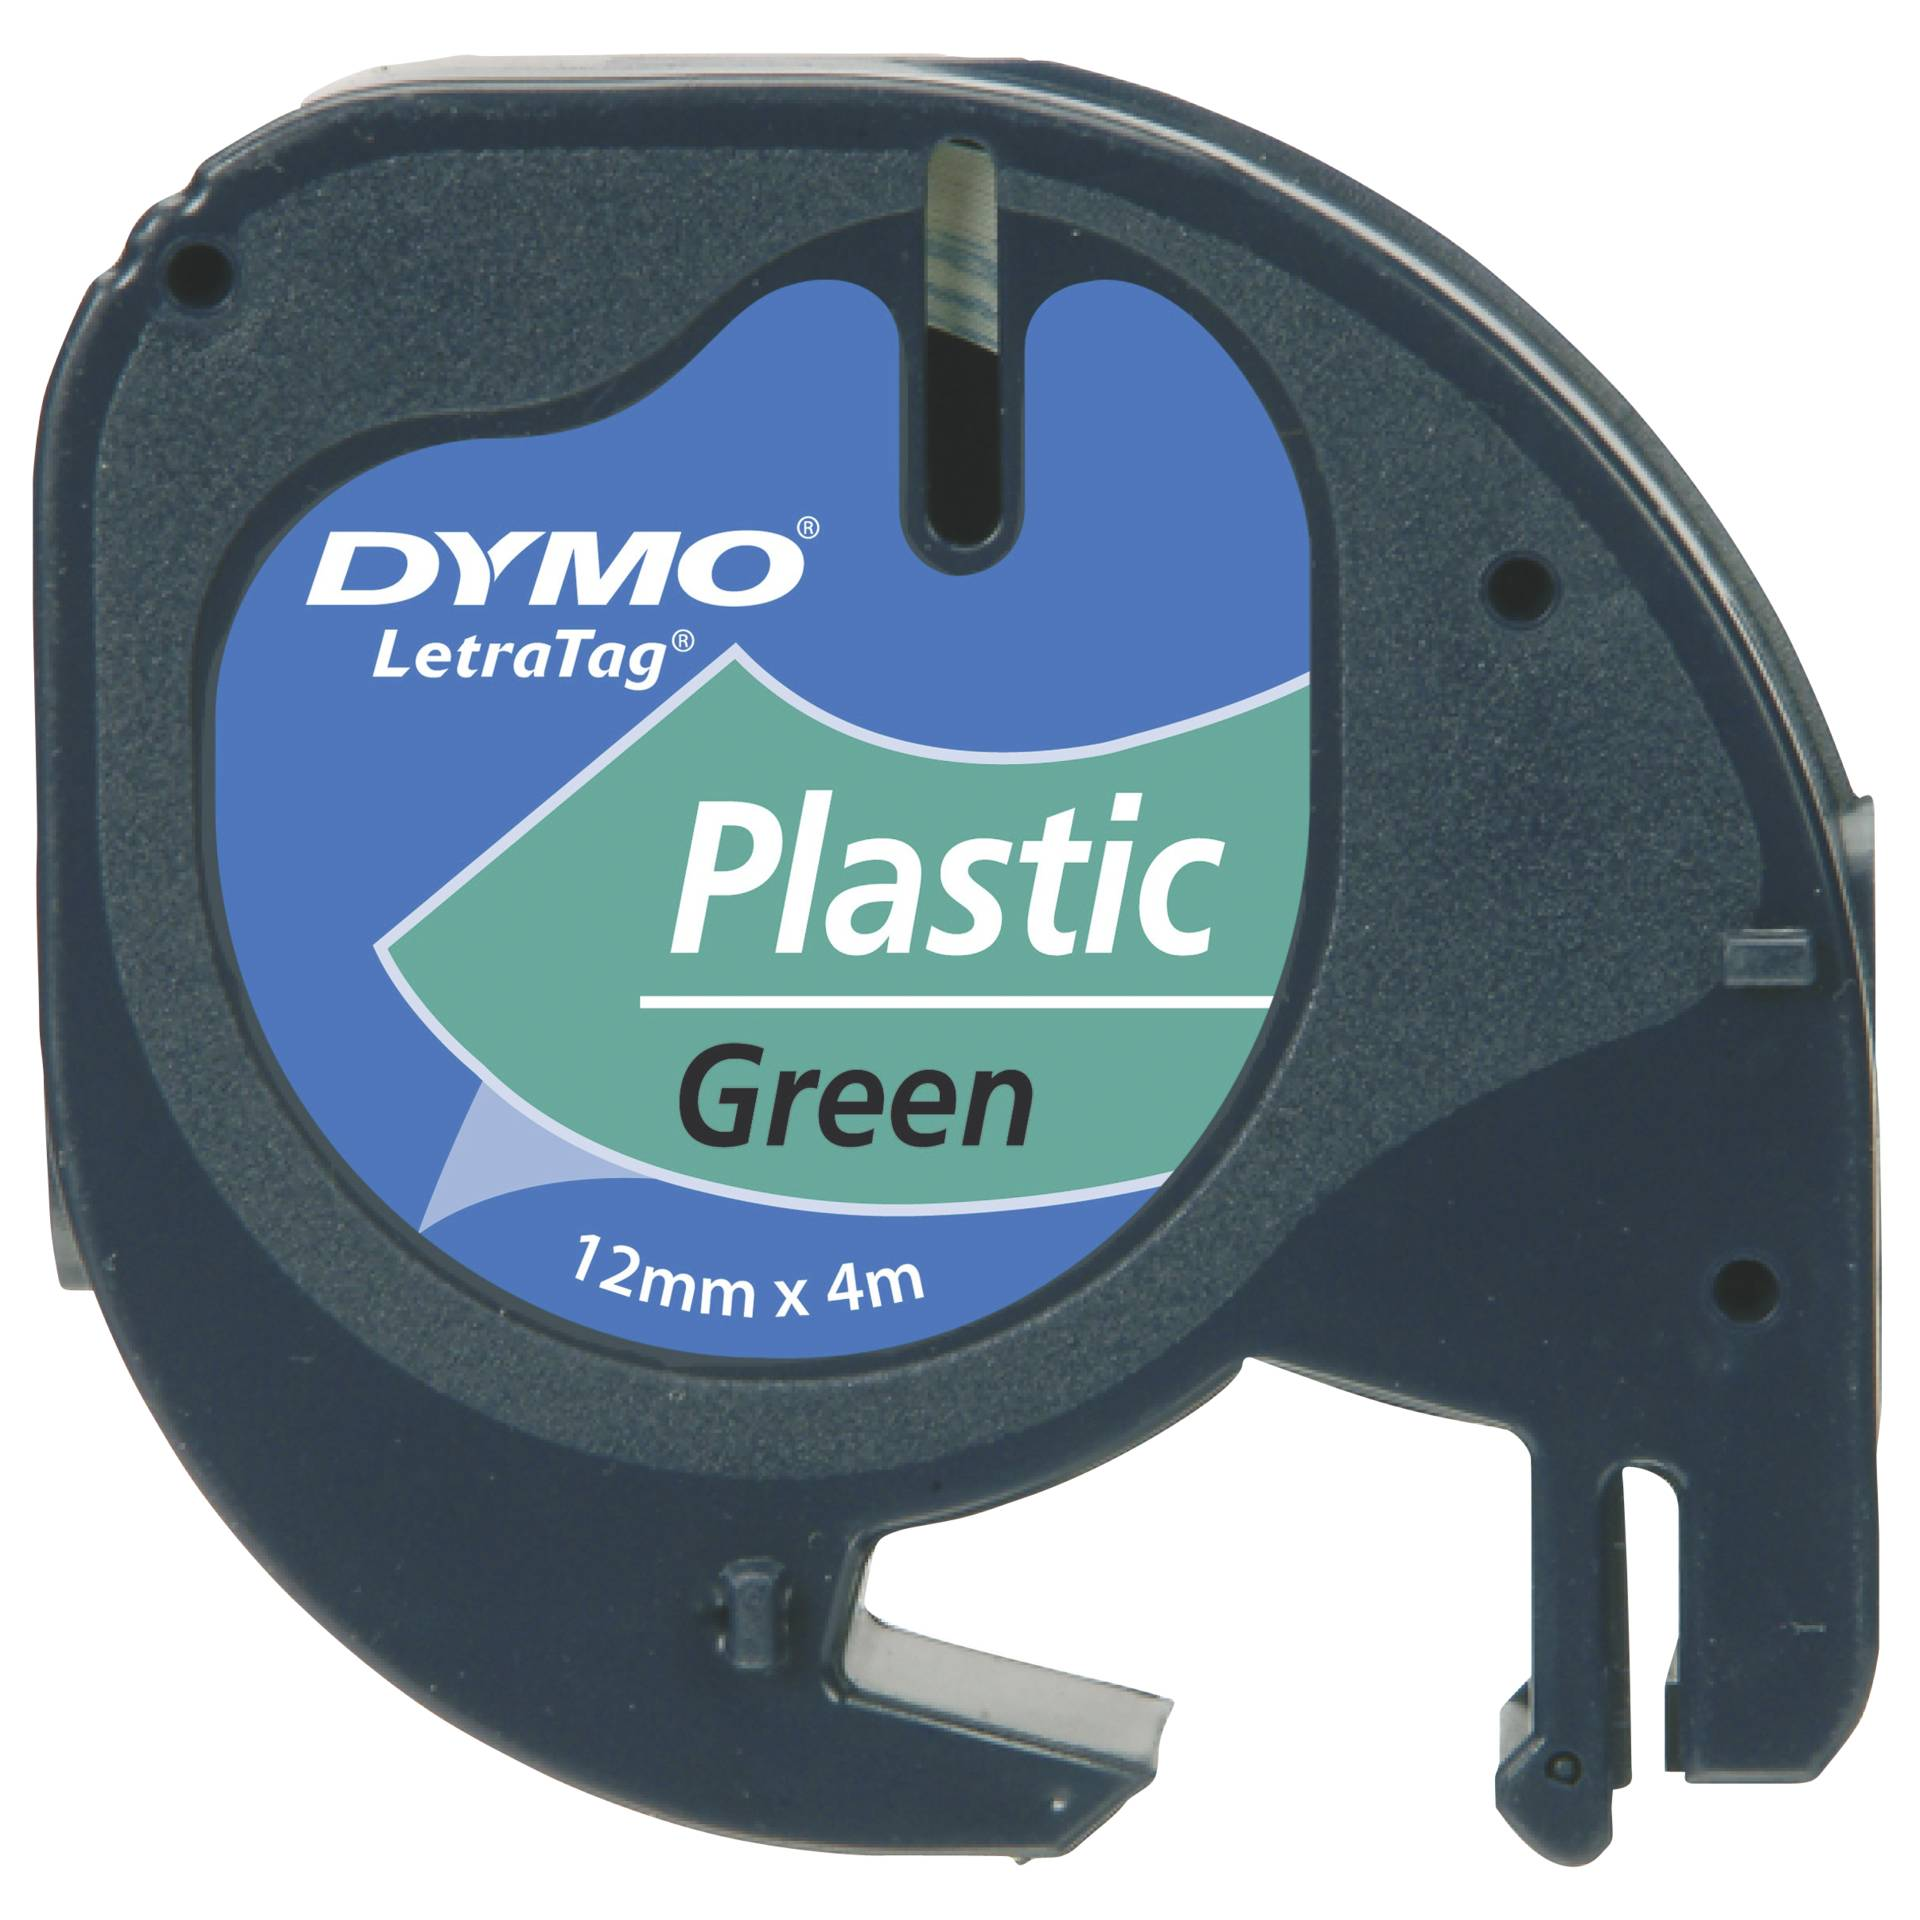 Dymo Letratag Band Plastik grün 12 mm x 4 m           91224